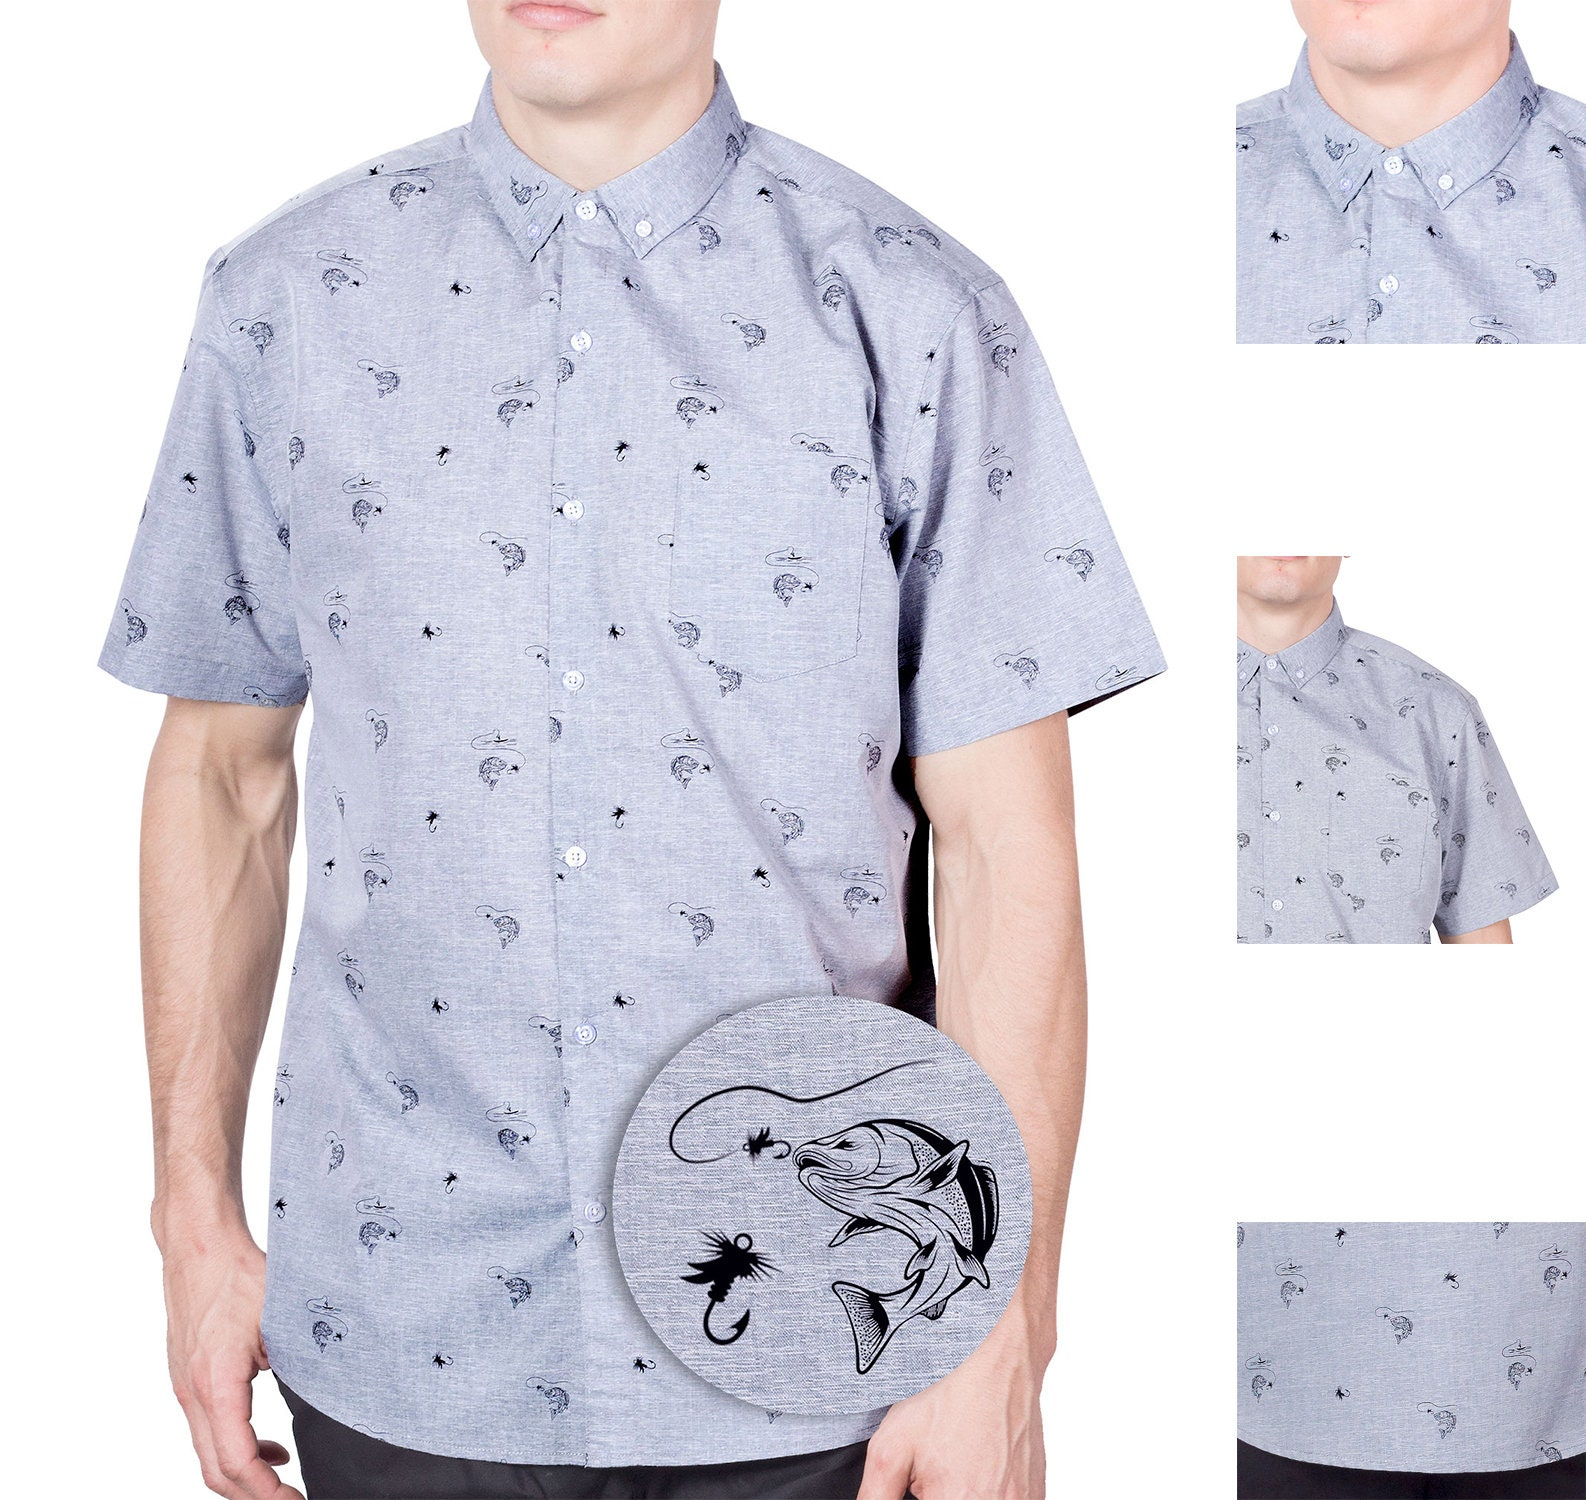 da6e1c6e1d739 Visive Hawaiian Shirt Short Sleeve Button Down Up Original